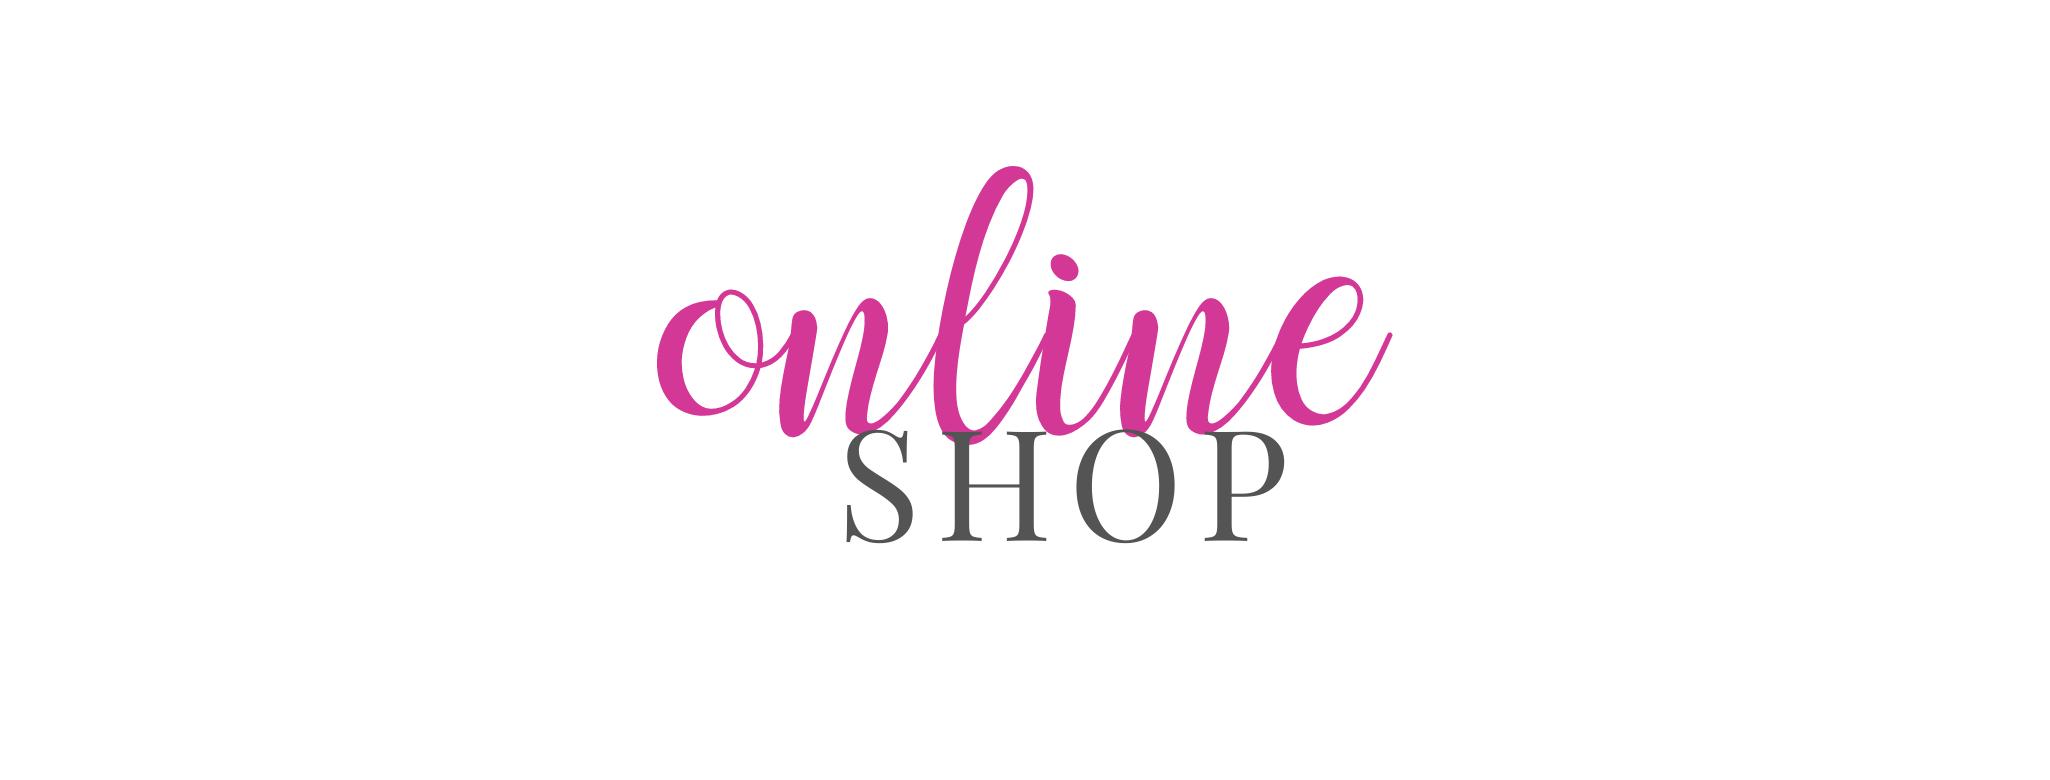 Stampin up OnlineShop Blog